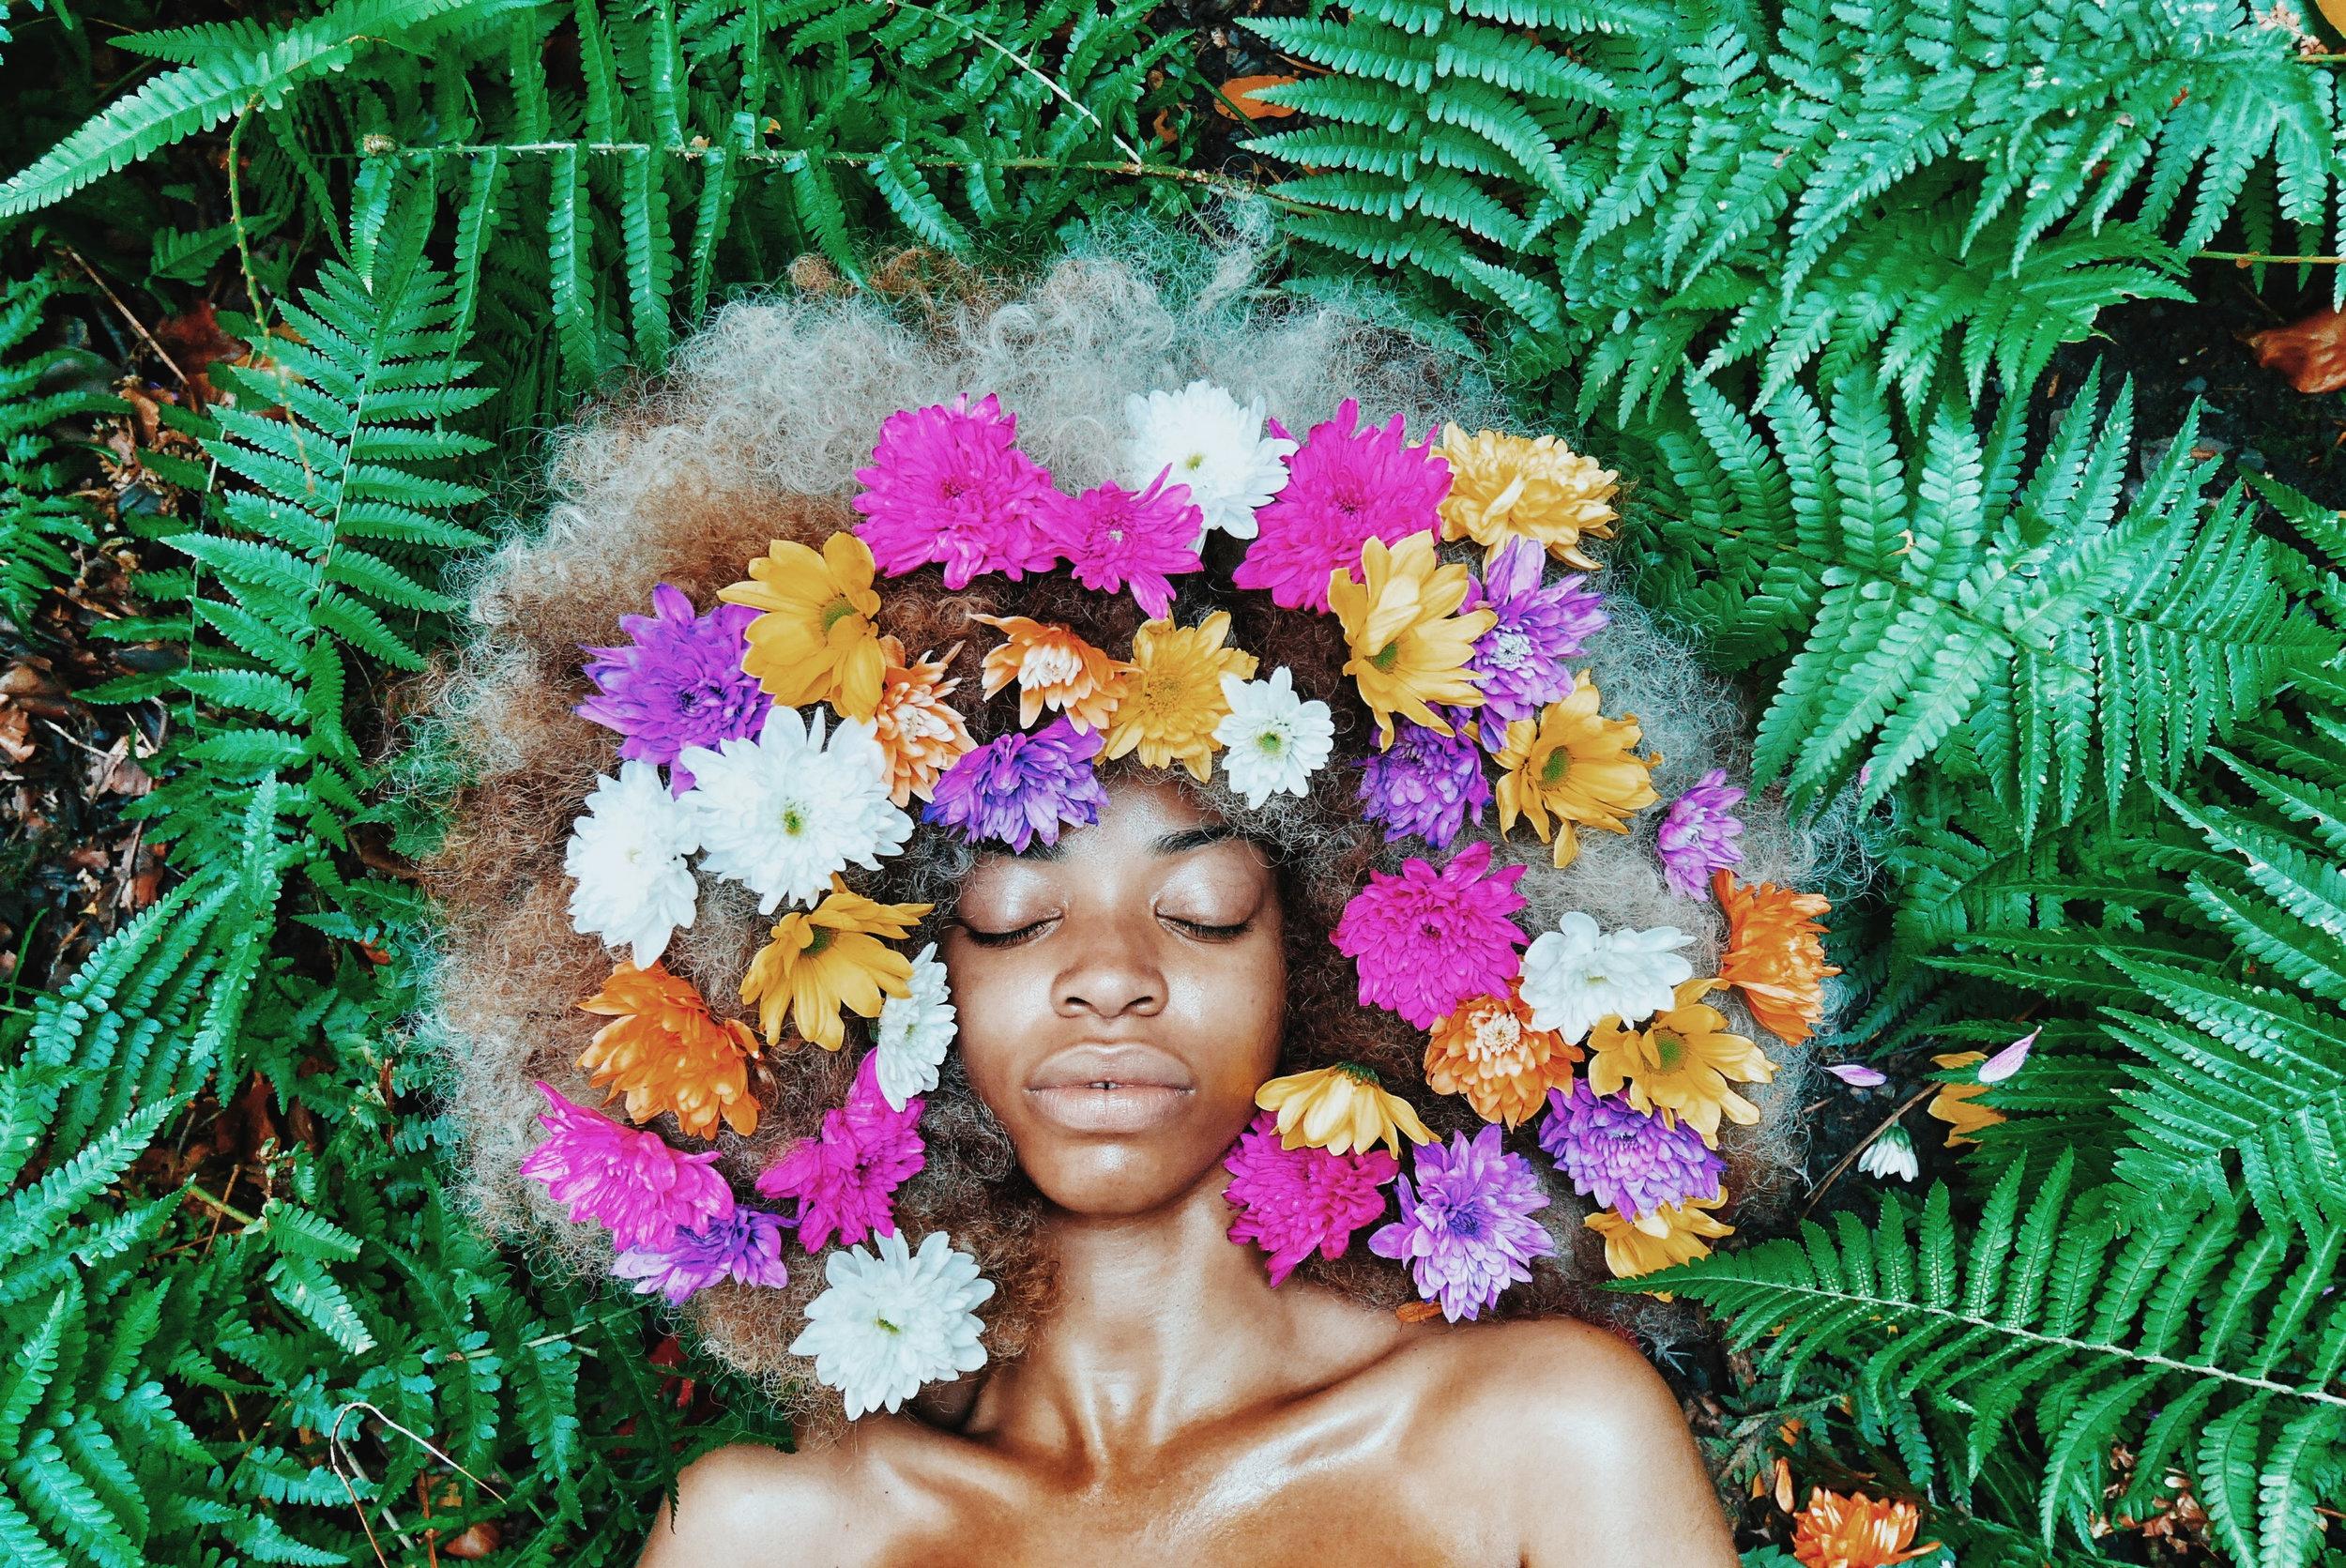 Canva - Woman With Floral Headdress Lying on Green Leaf Plants.jpg